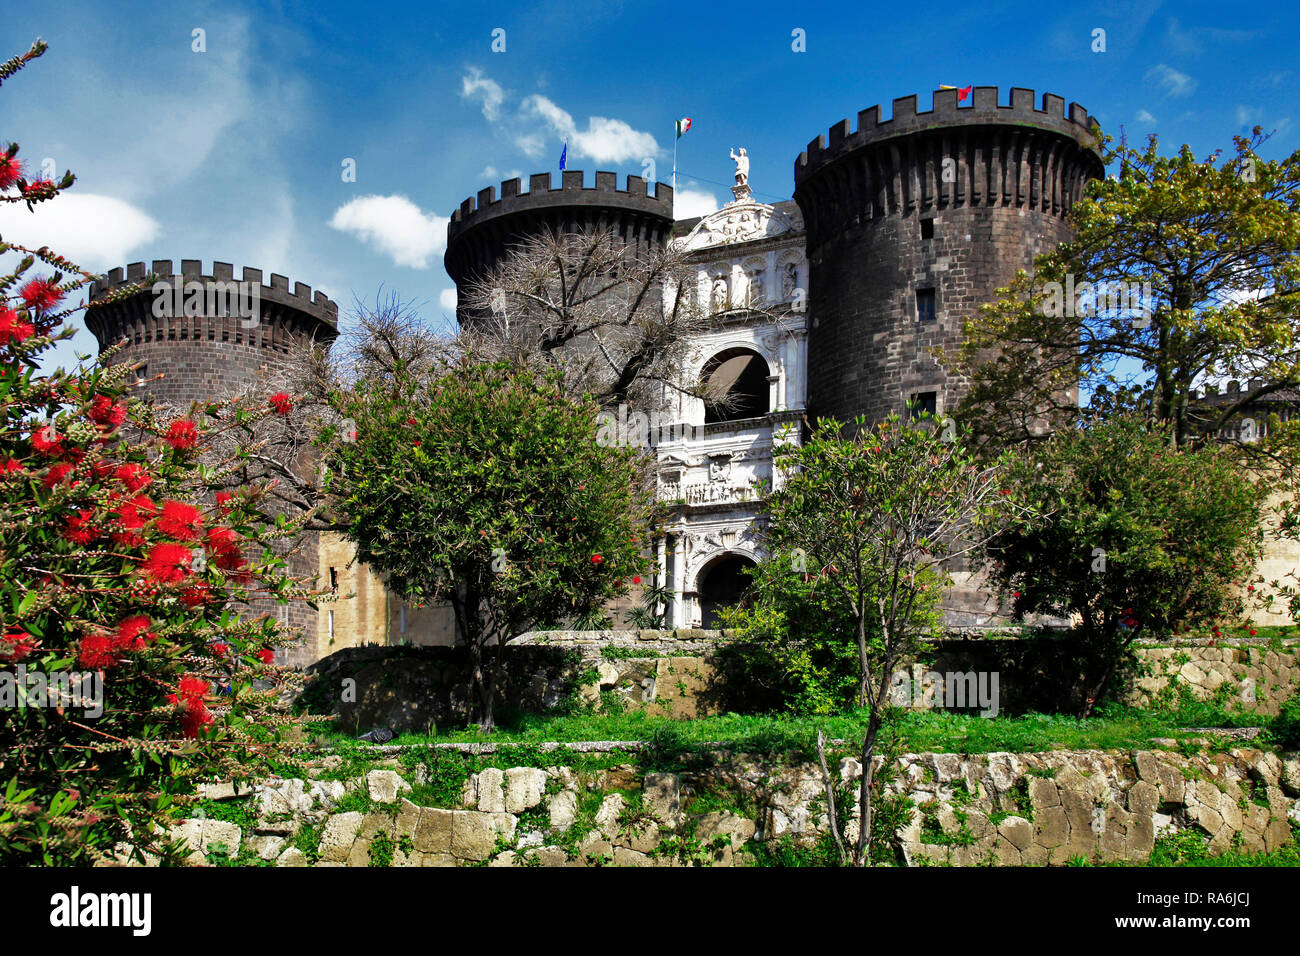 Castel Nuovo, Neapel, Kampanien, Italien - Stock Image